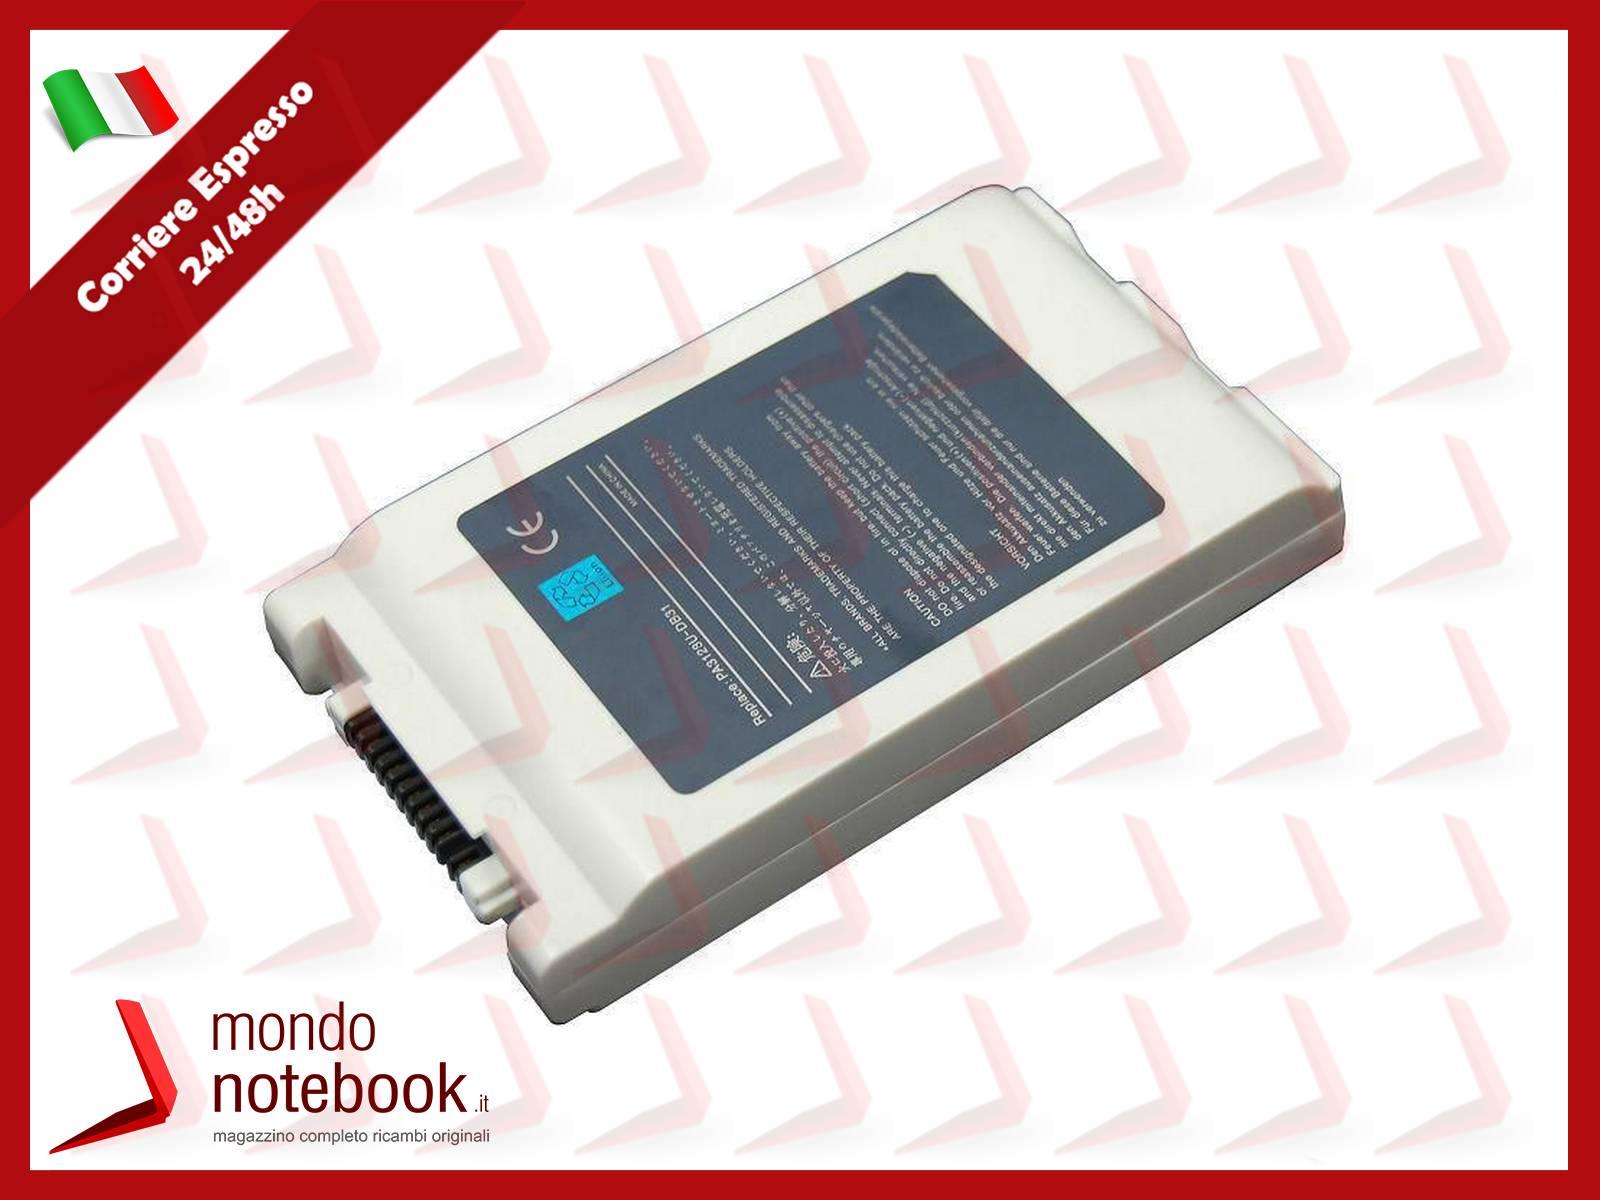 https://www.mondonotebook.it/13359/trackpad-touchpad-apple-per-macbook-pro-13-a1369-a1466-md231-2011-2012.jpg